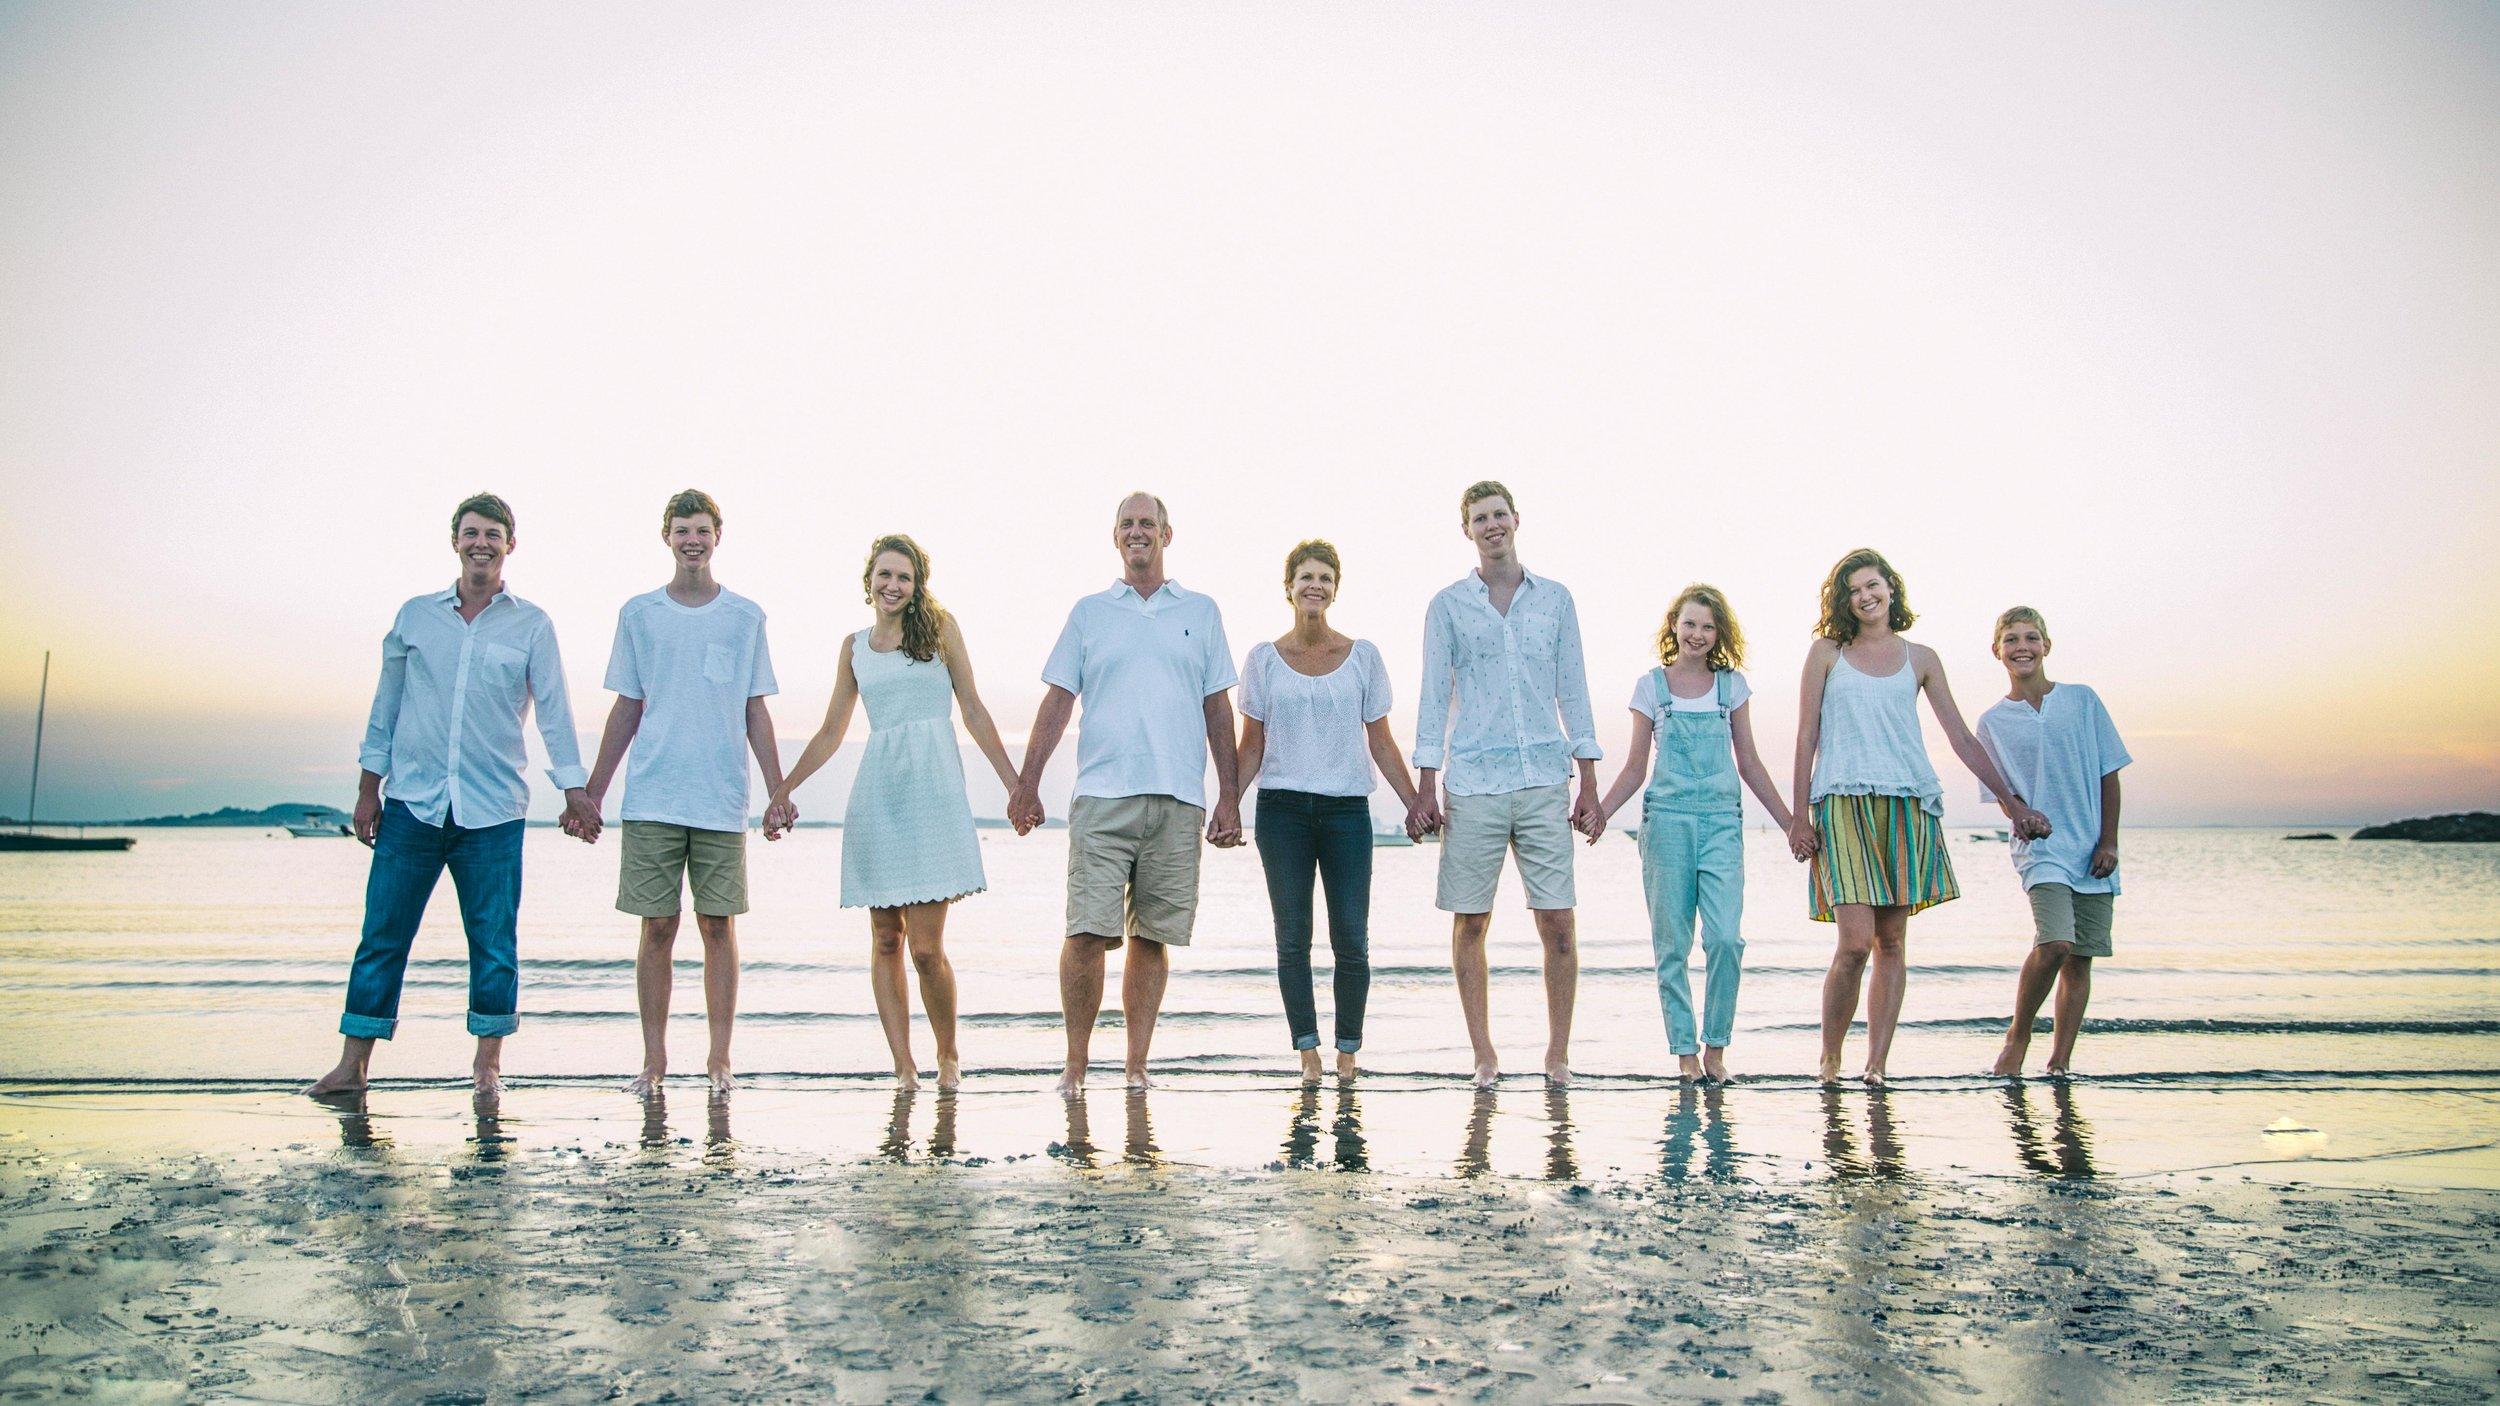 Traditional beach family portrait, Rockport, MA.